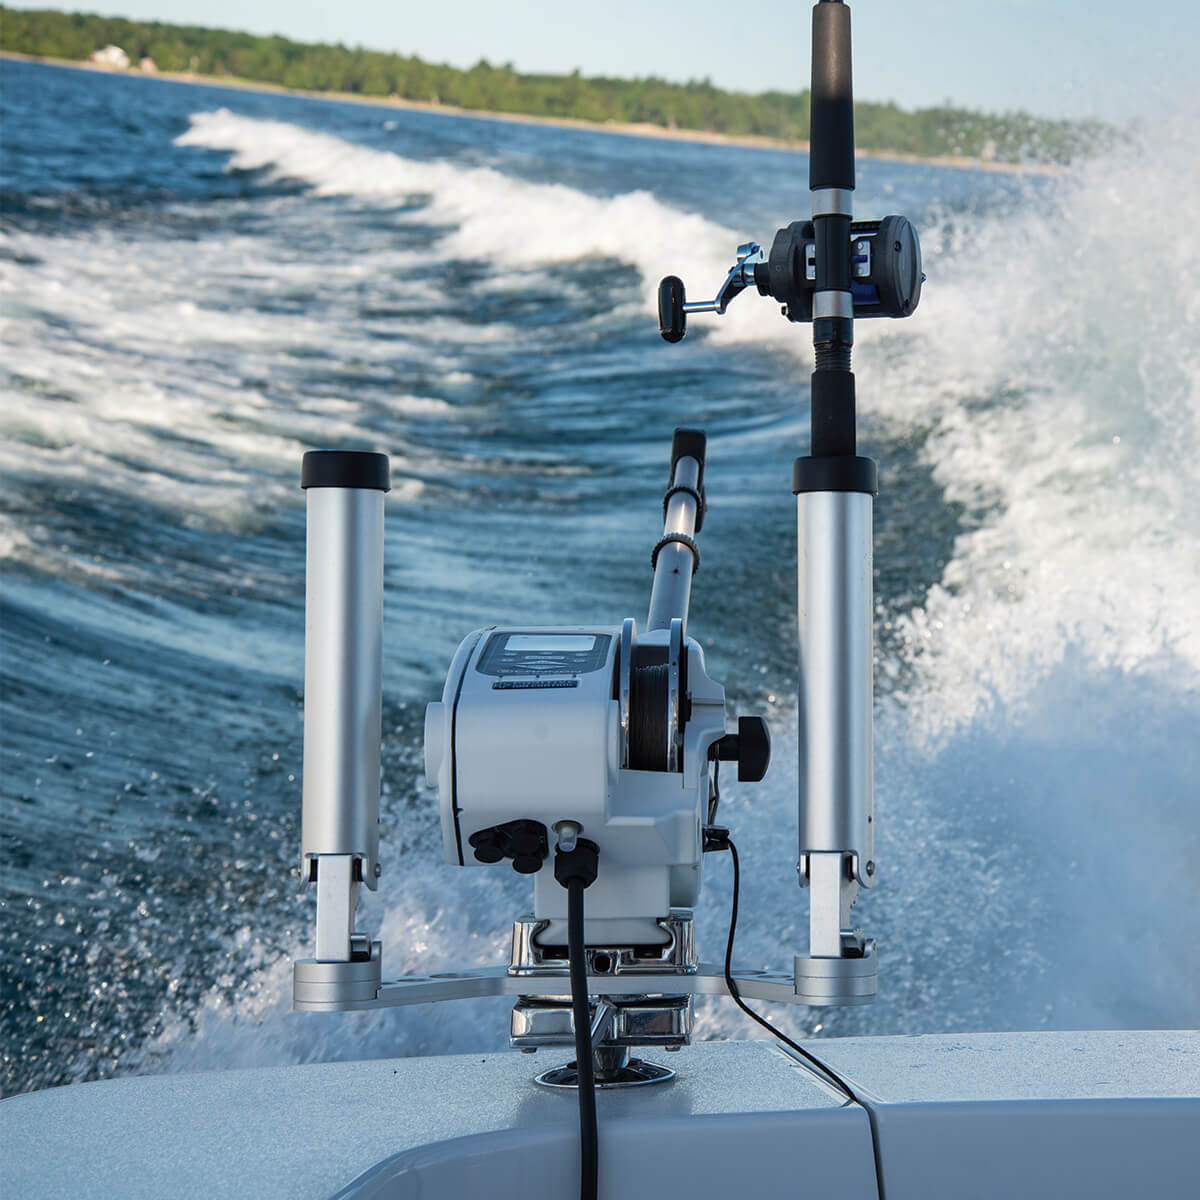 Dypriggere Tilbehør CANNON dobbel Justerbar 360° stangholder Dual Axis 6 trinn låsemulighetdyprigger 117995